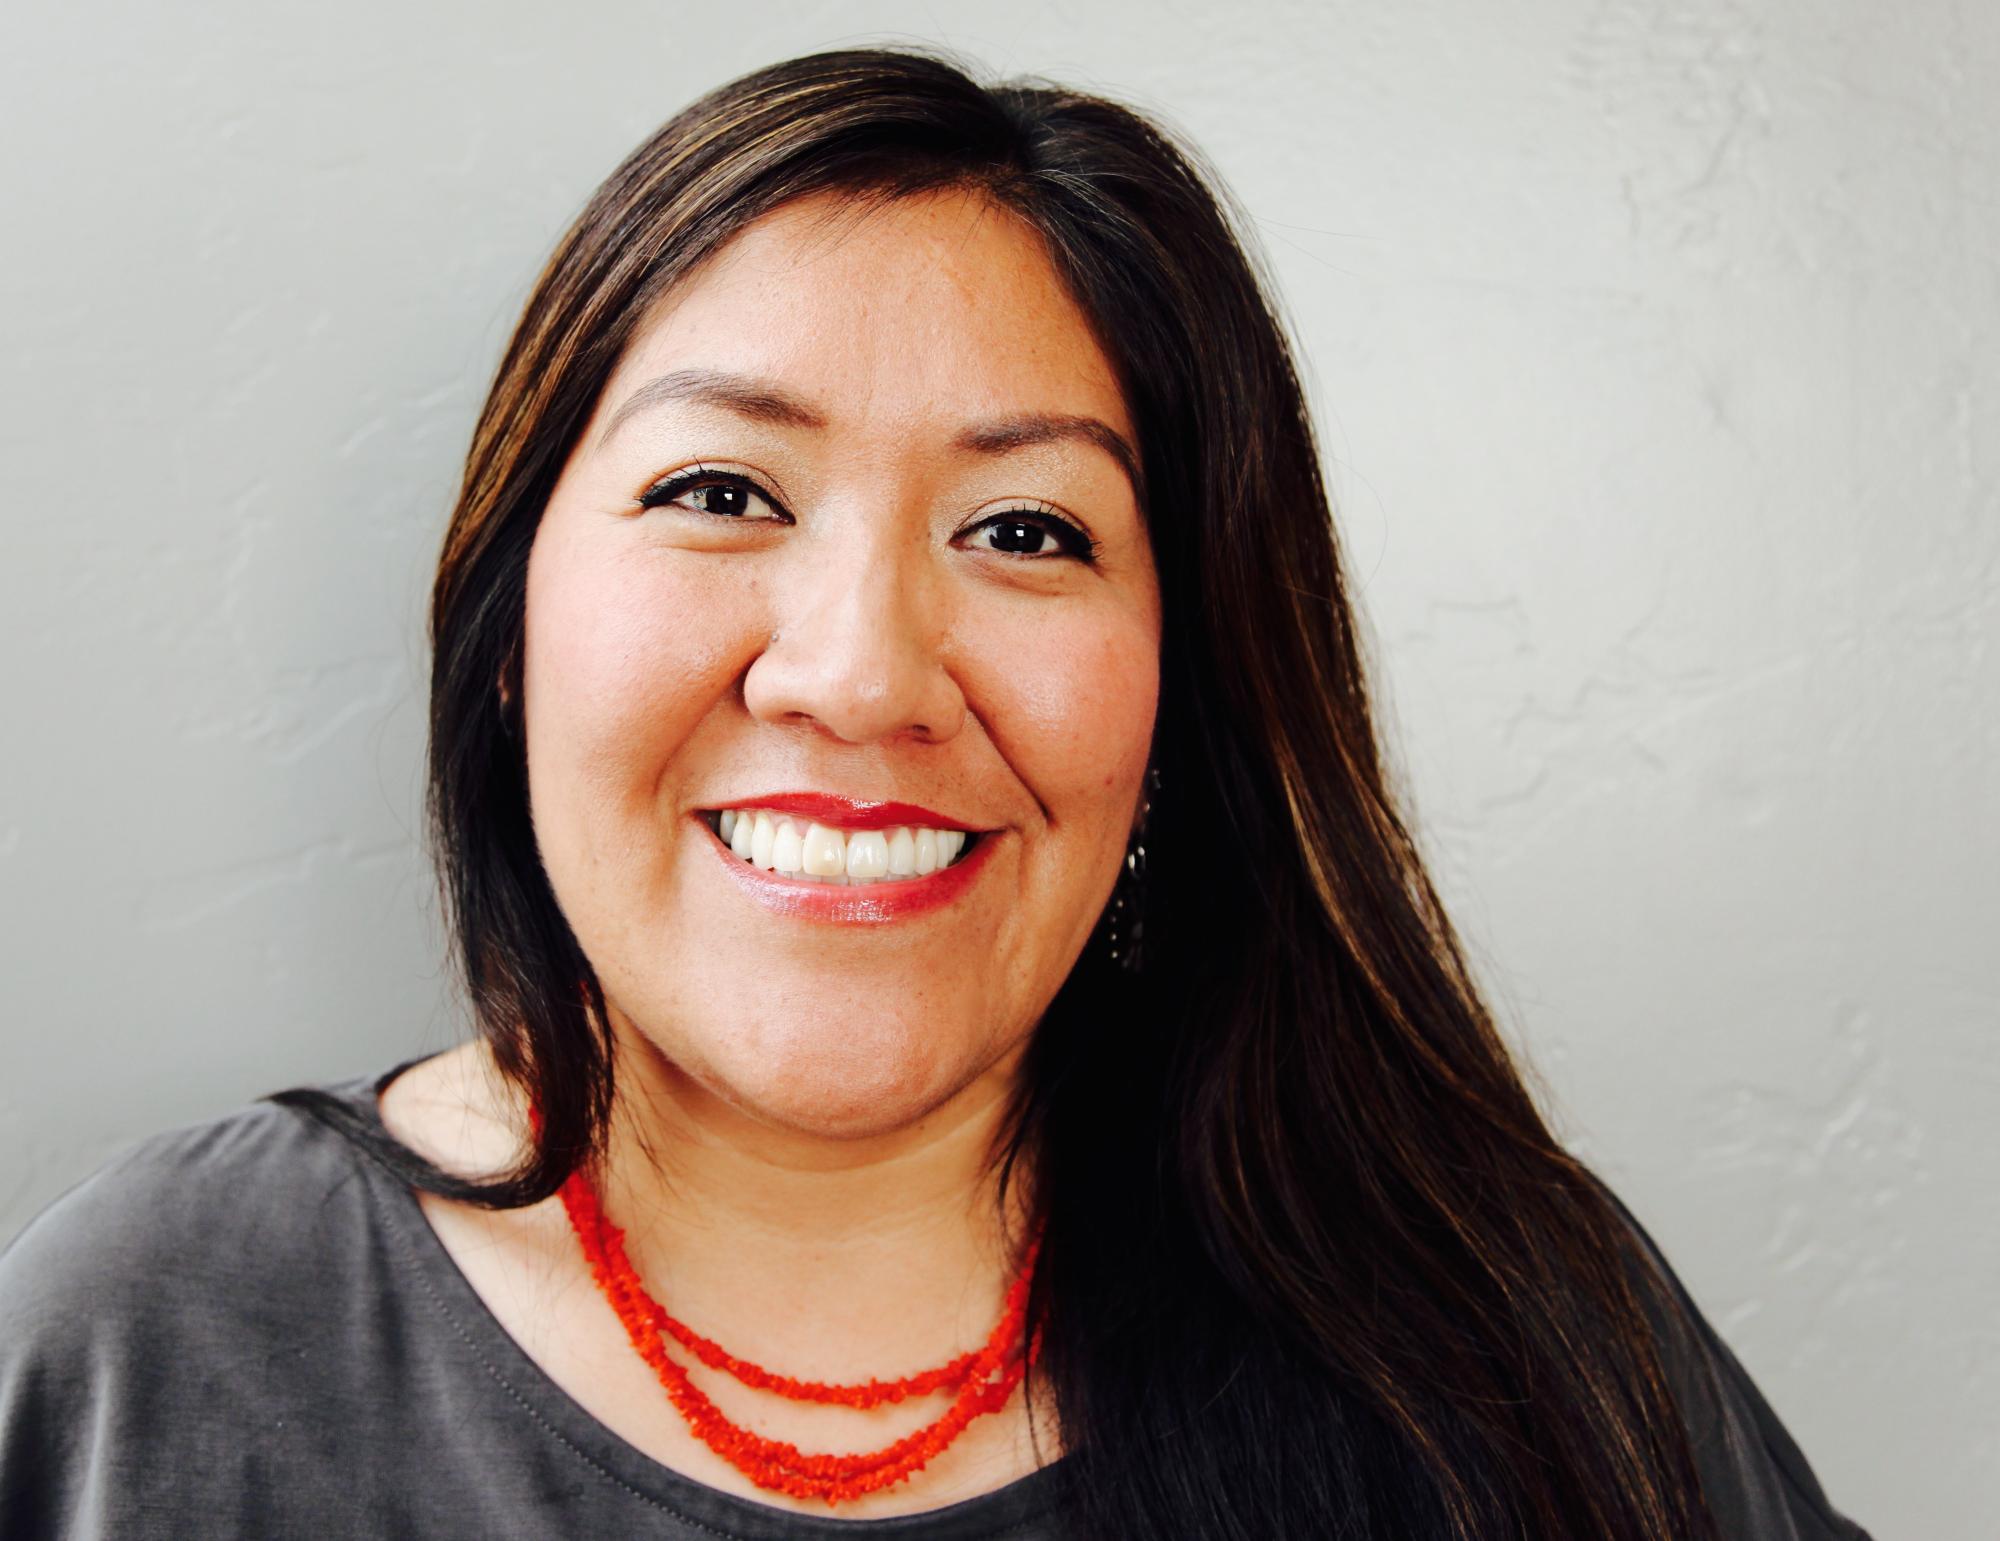 Amanda Tachine is from Ganado, Arizona. Tachine is Náneesht'ézhí Táchii'nii  born for Tl'izilani . Her maternal grandfather's clan is Tábaahí  and her paternal grandfather's clan is Ashiihi .